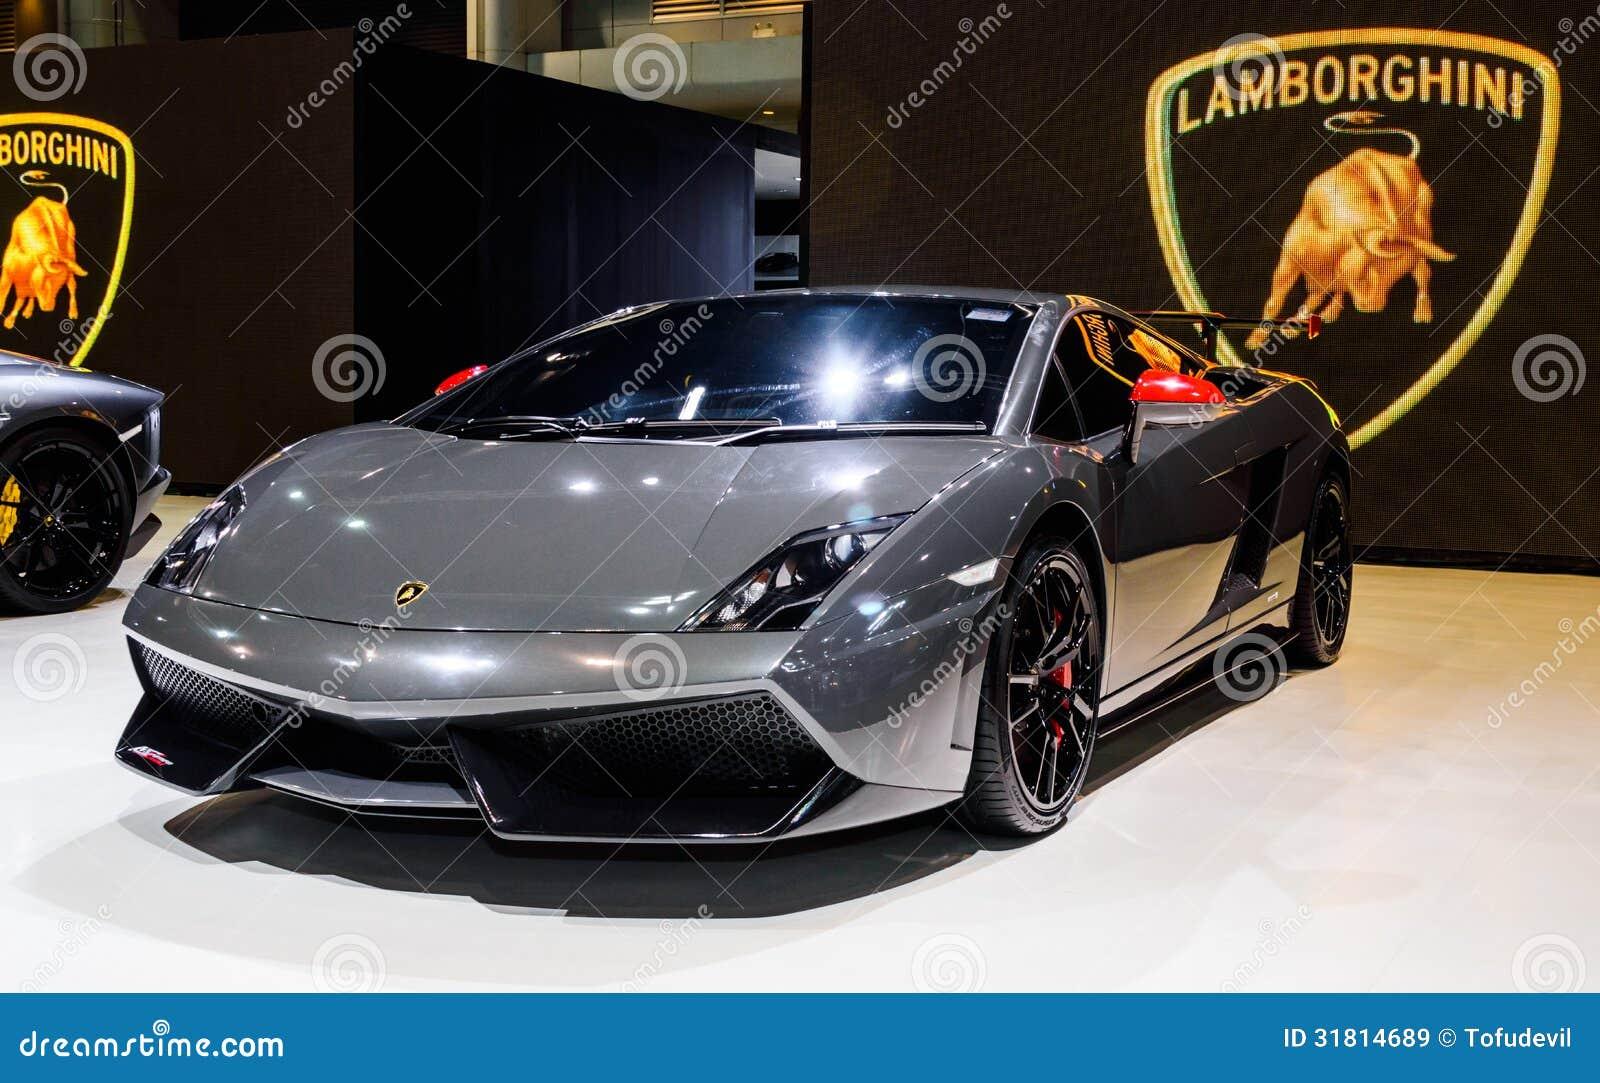 Lamborghini Editorial Stock Image Image Of Automobile 31814689